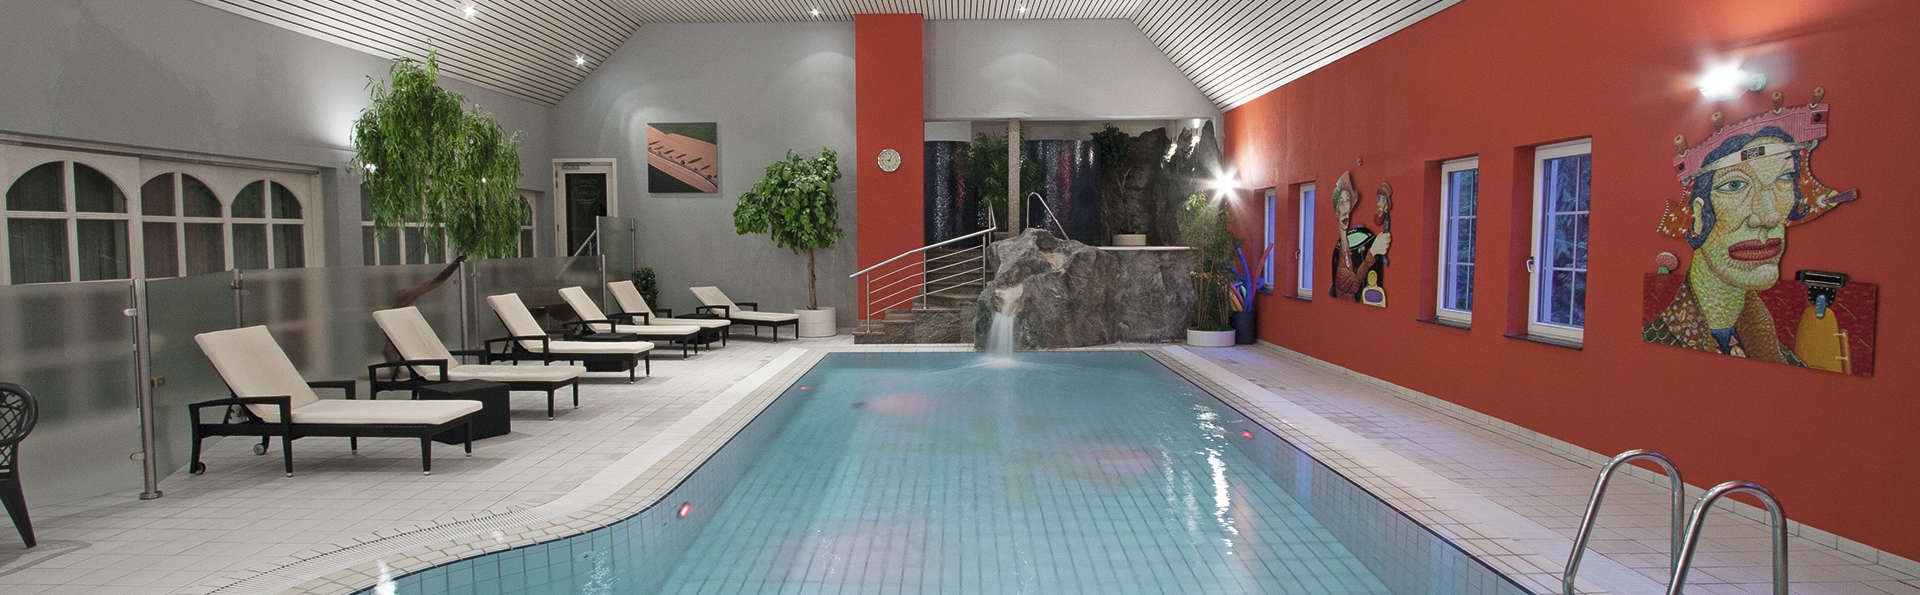 Hotel International - EDIT_pool.jpg